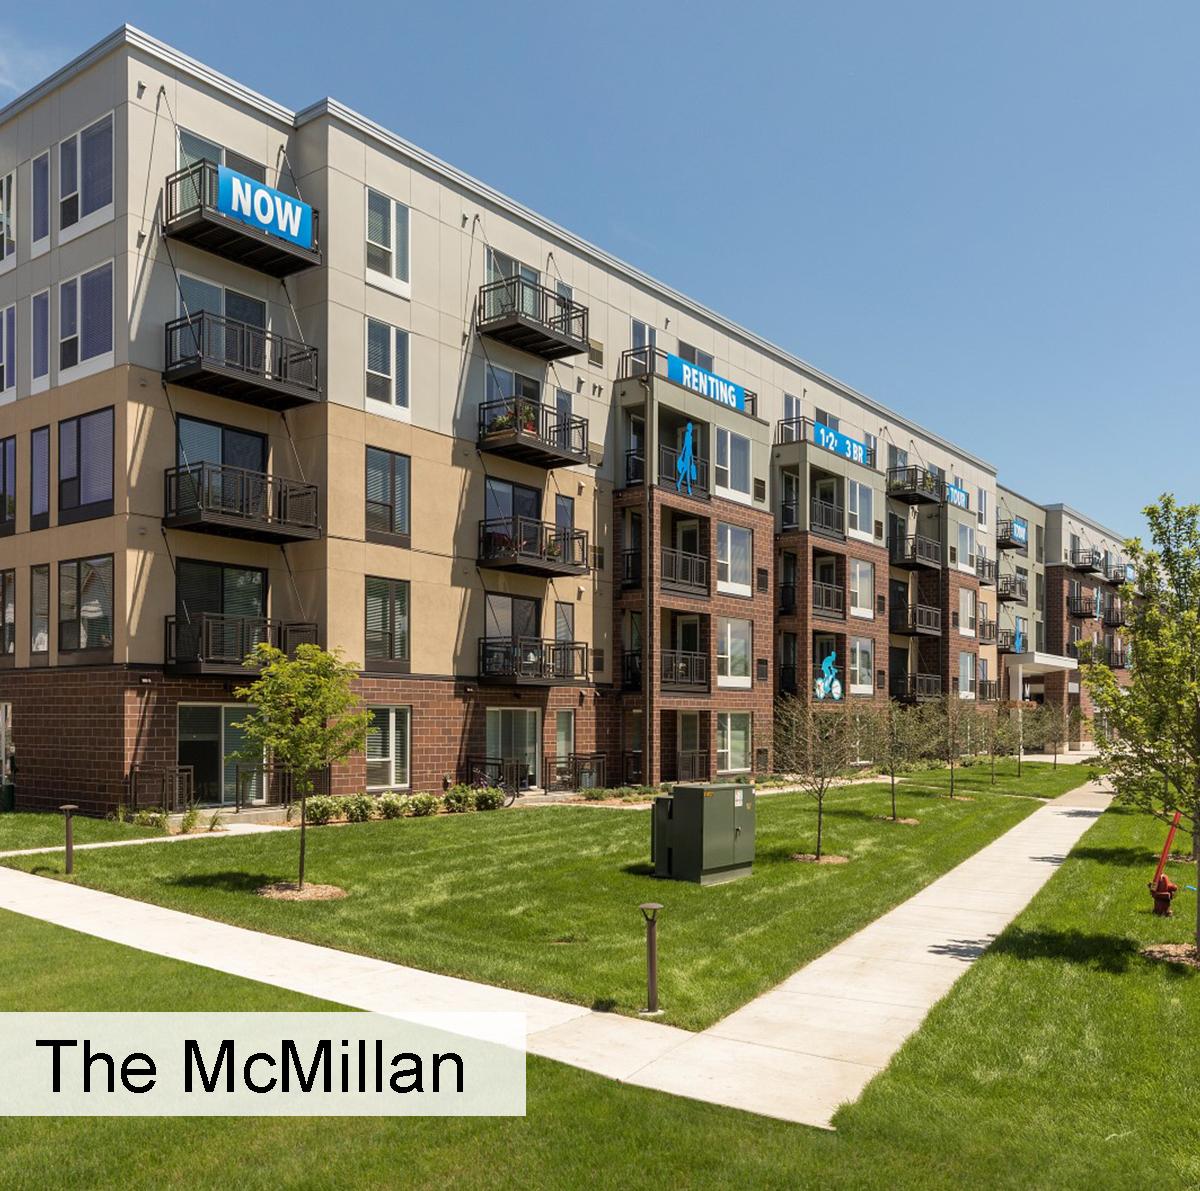 The McMillan